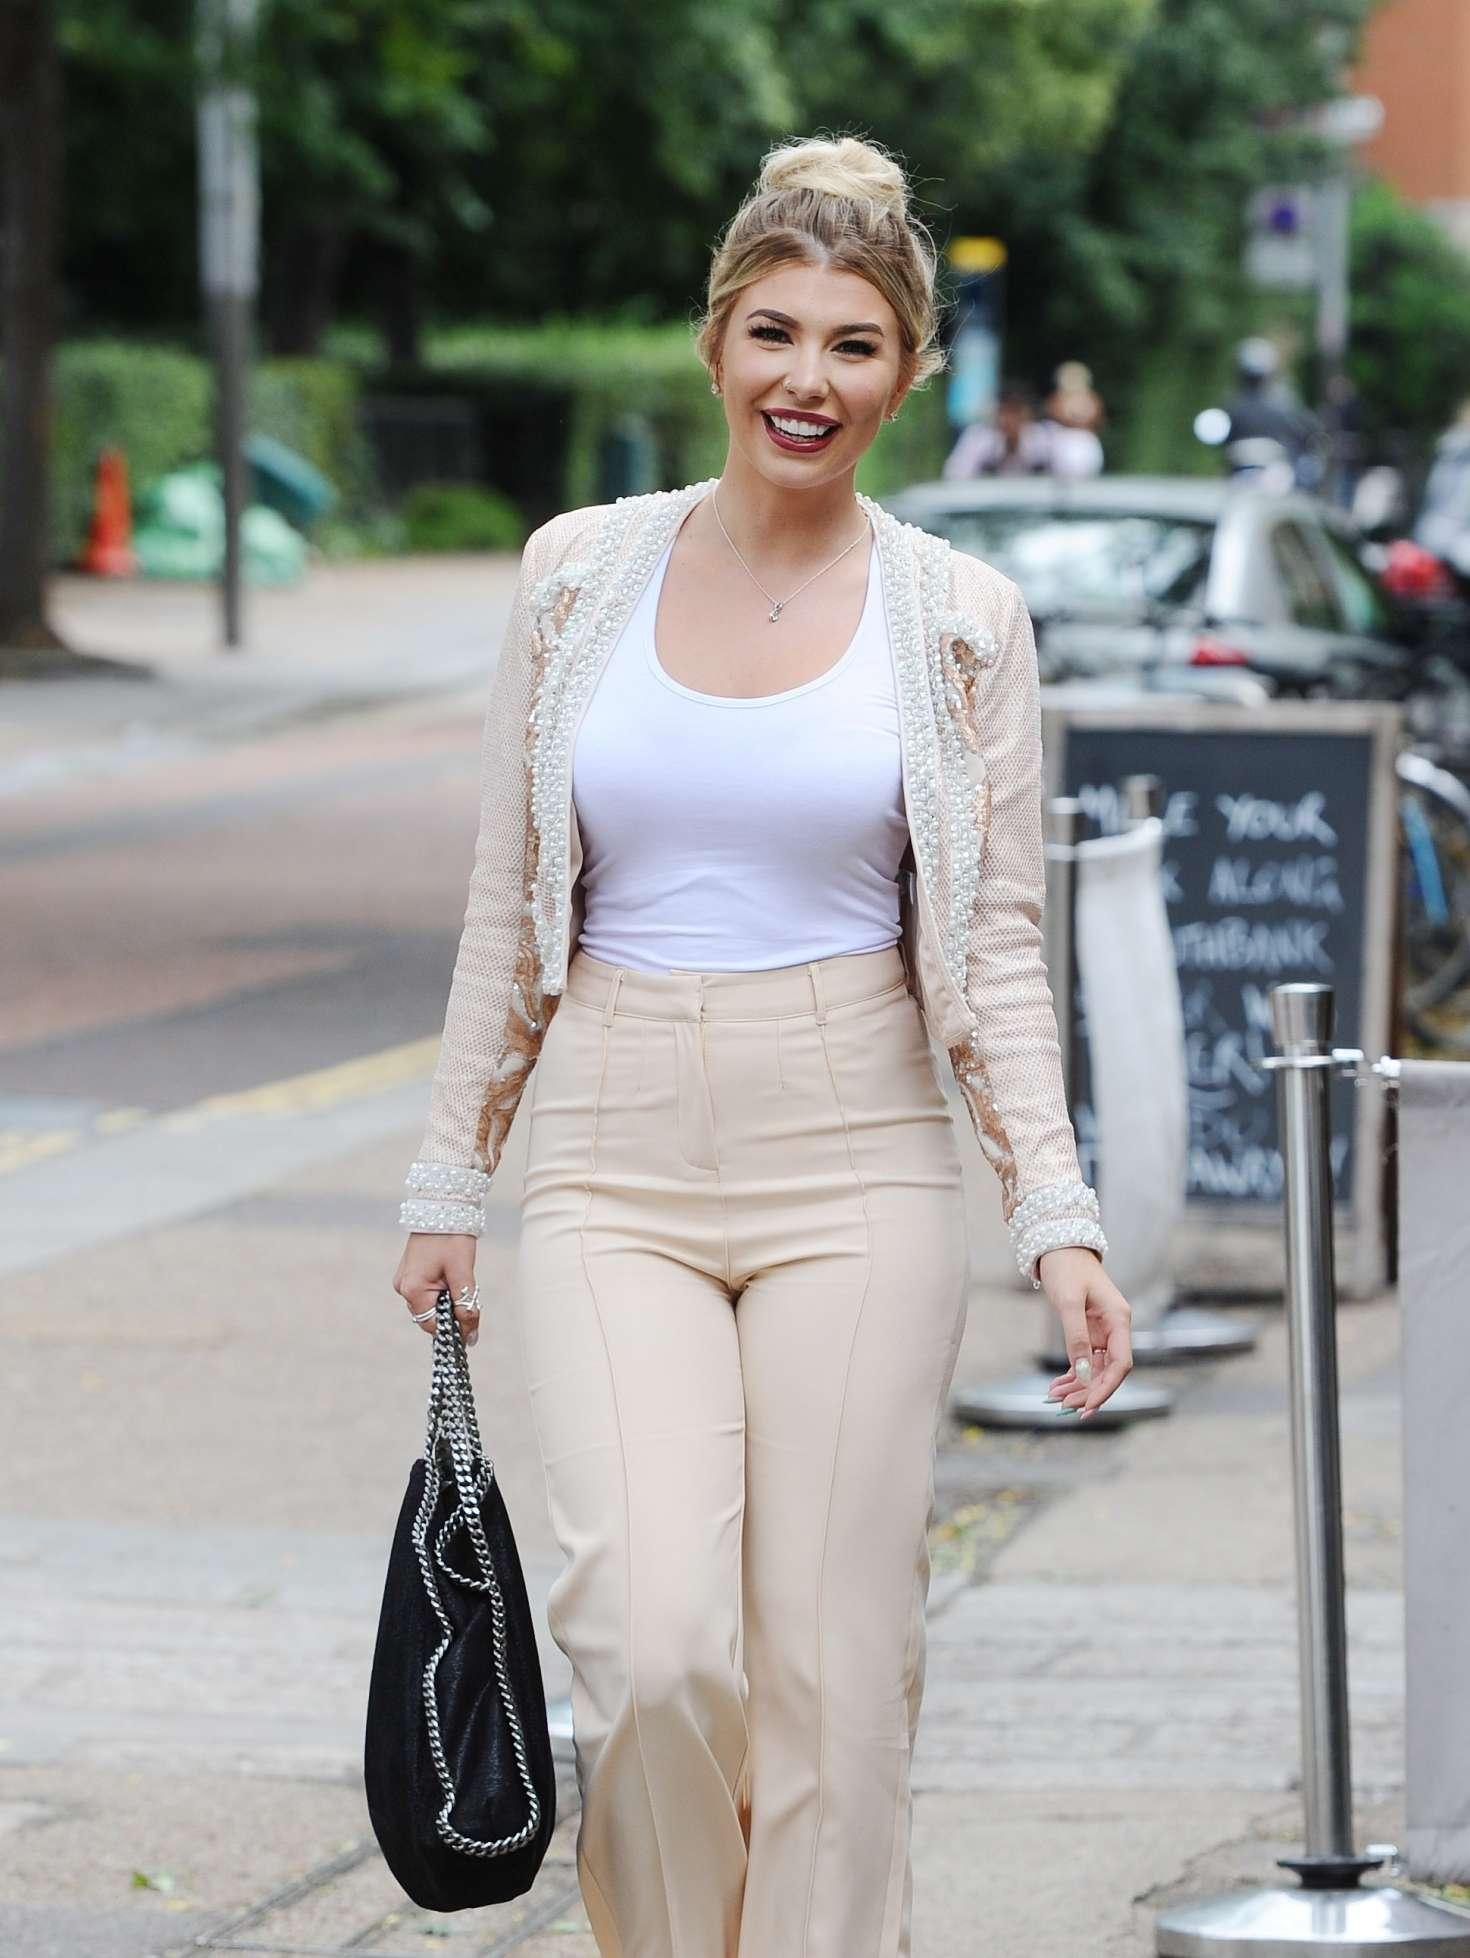 Olivia Buckland - Leaving ITV Studios in London